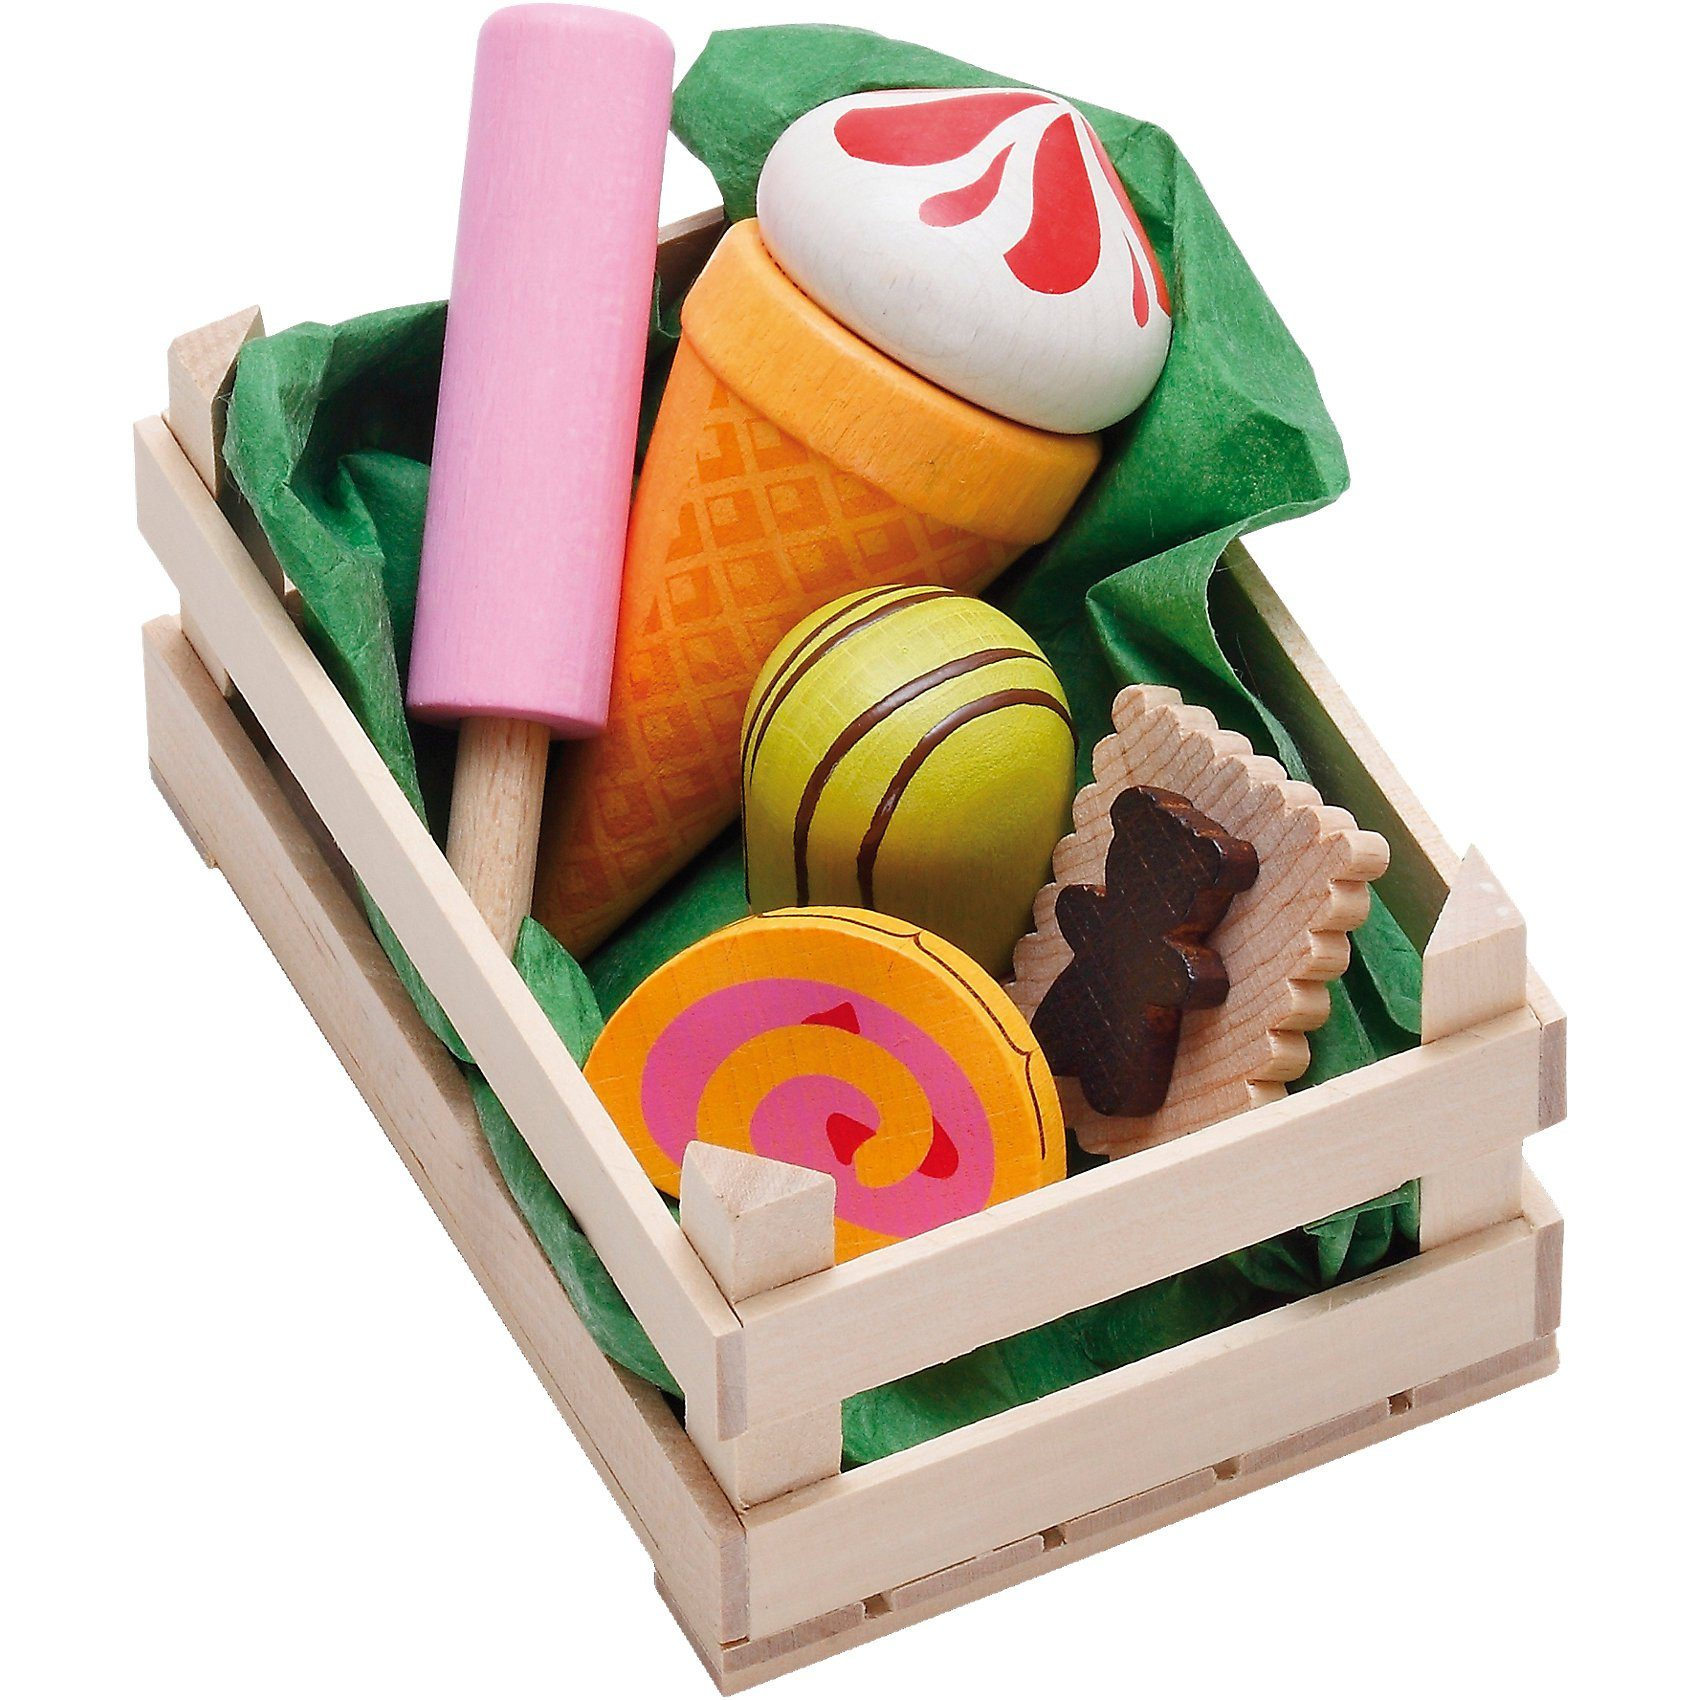 ERZI Spiellebensmittel Sortiment Süßwaren